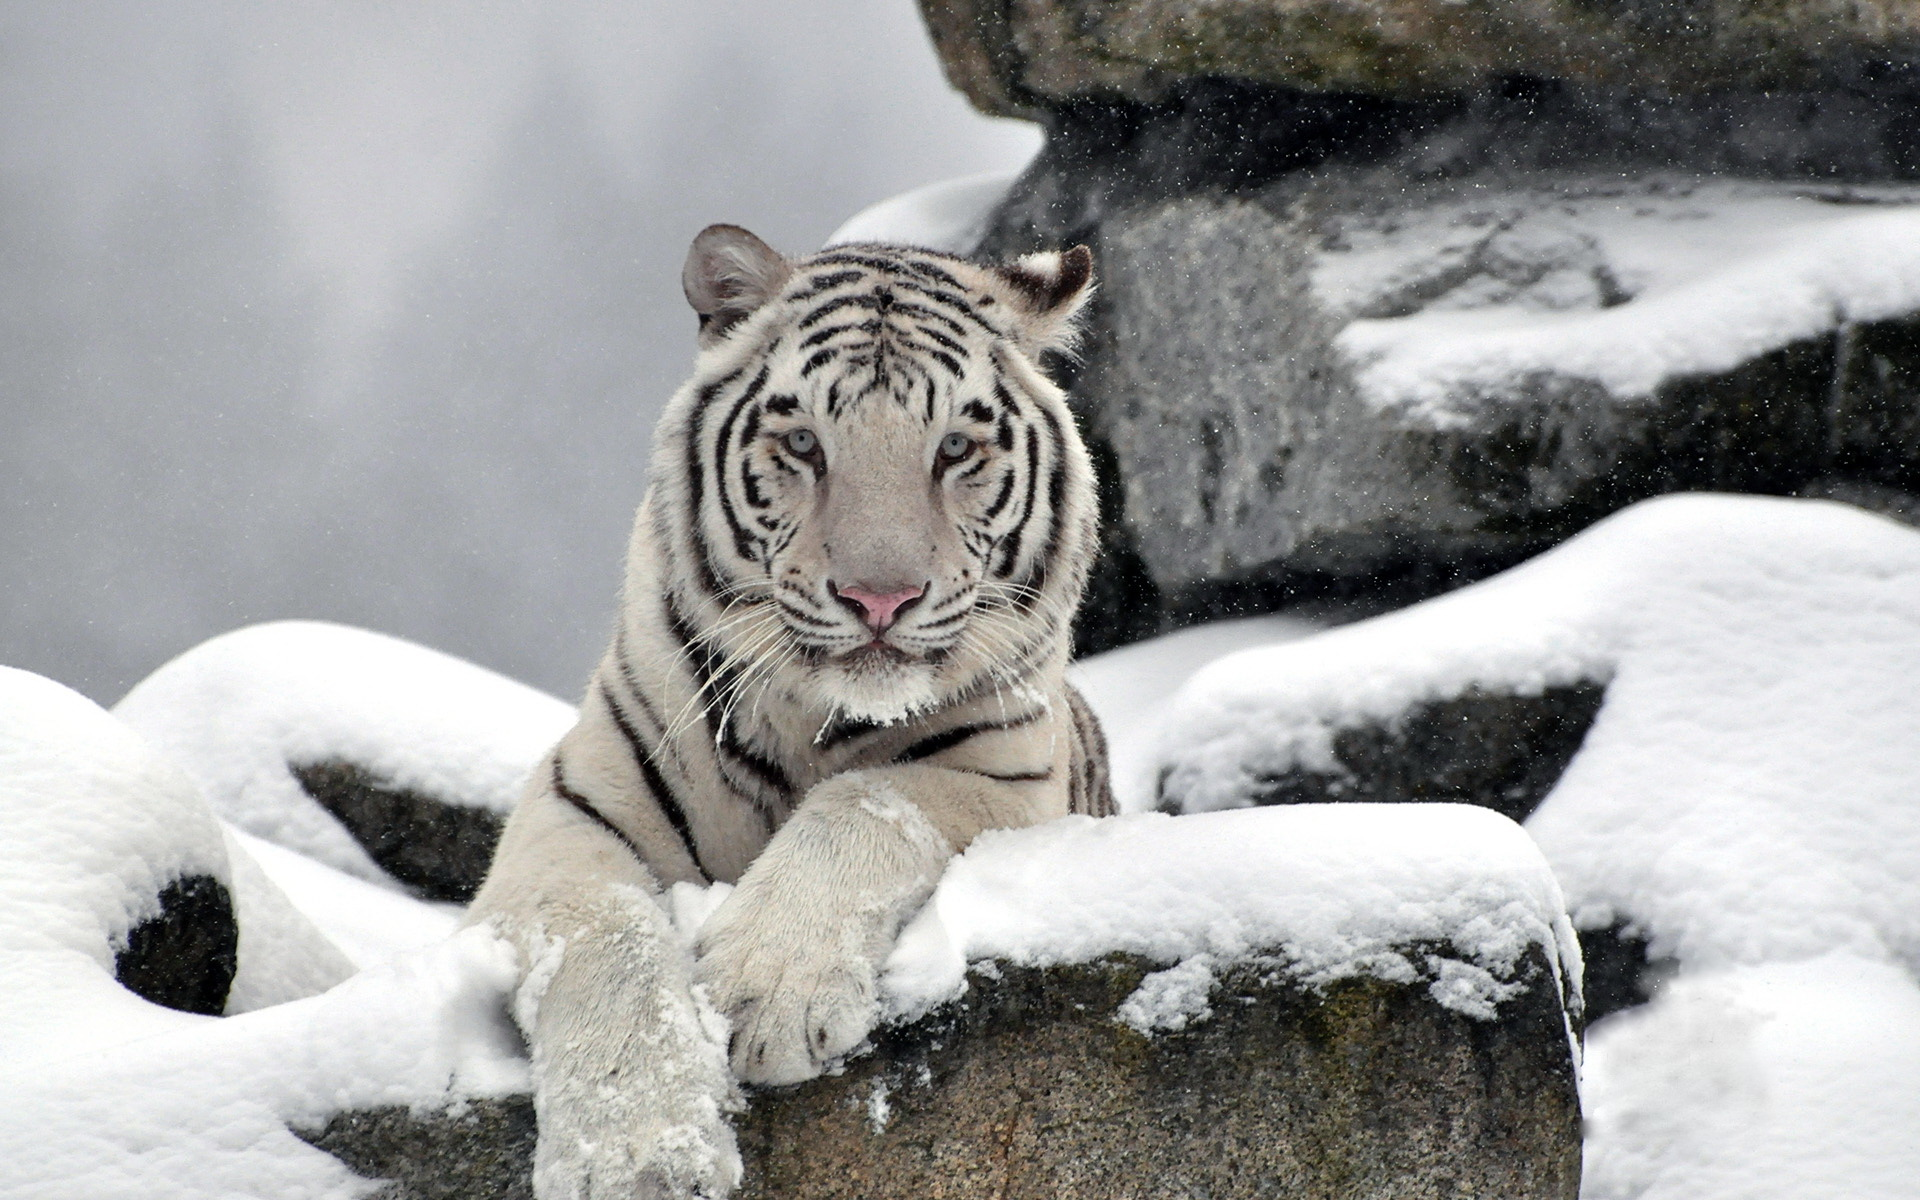 White siberian tiger in snow - photo#7